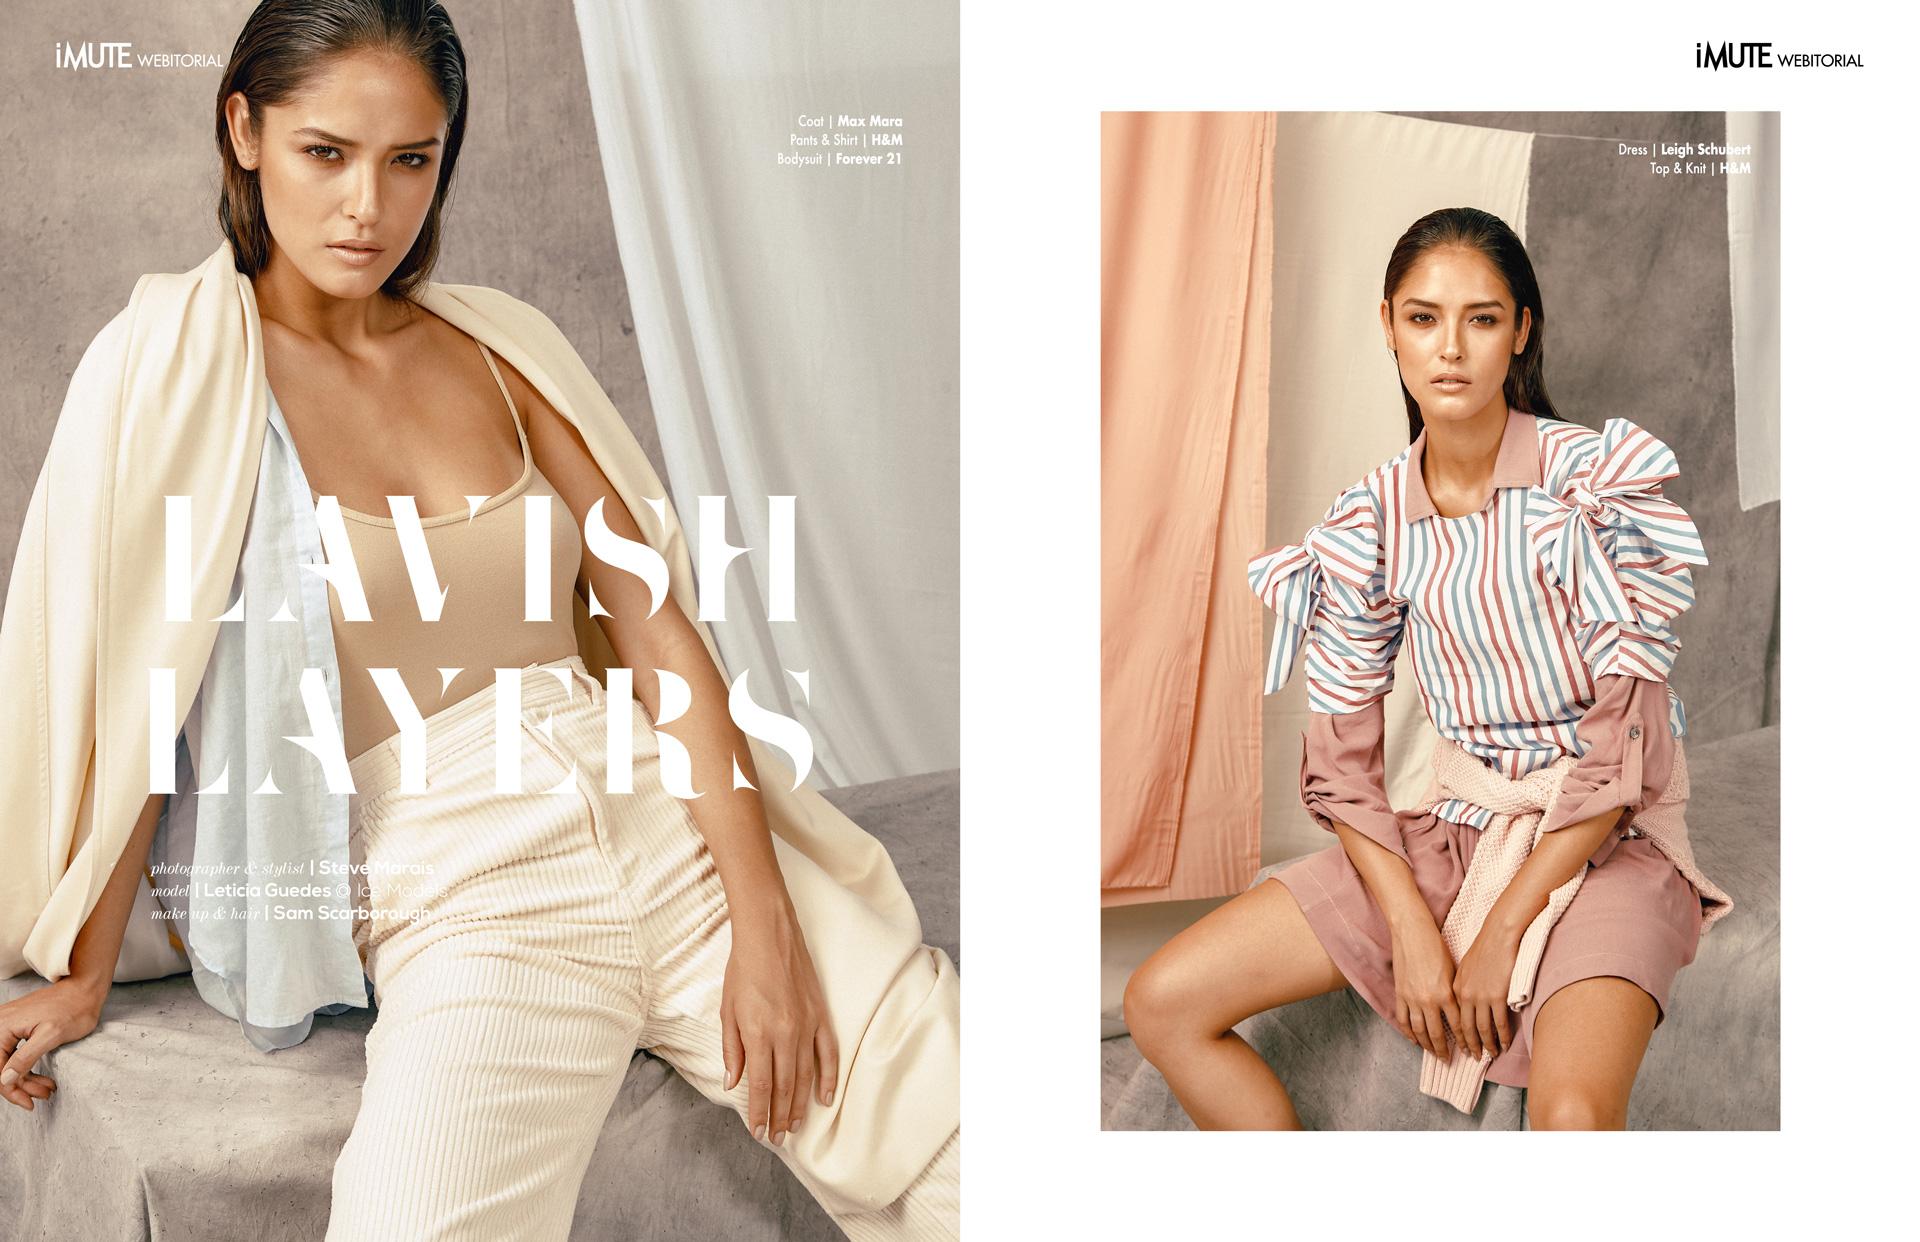 Lavish Layers definition webitorial for iMute Magazine Photographer & Stylist | Steve Marais Model | Leticia Guedes @ Ice Models Makeup & Hair | Sam Scarborough